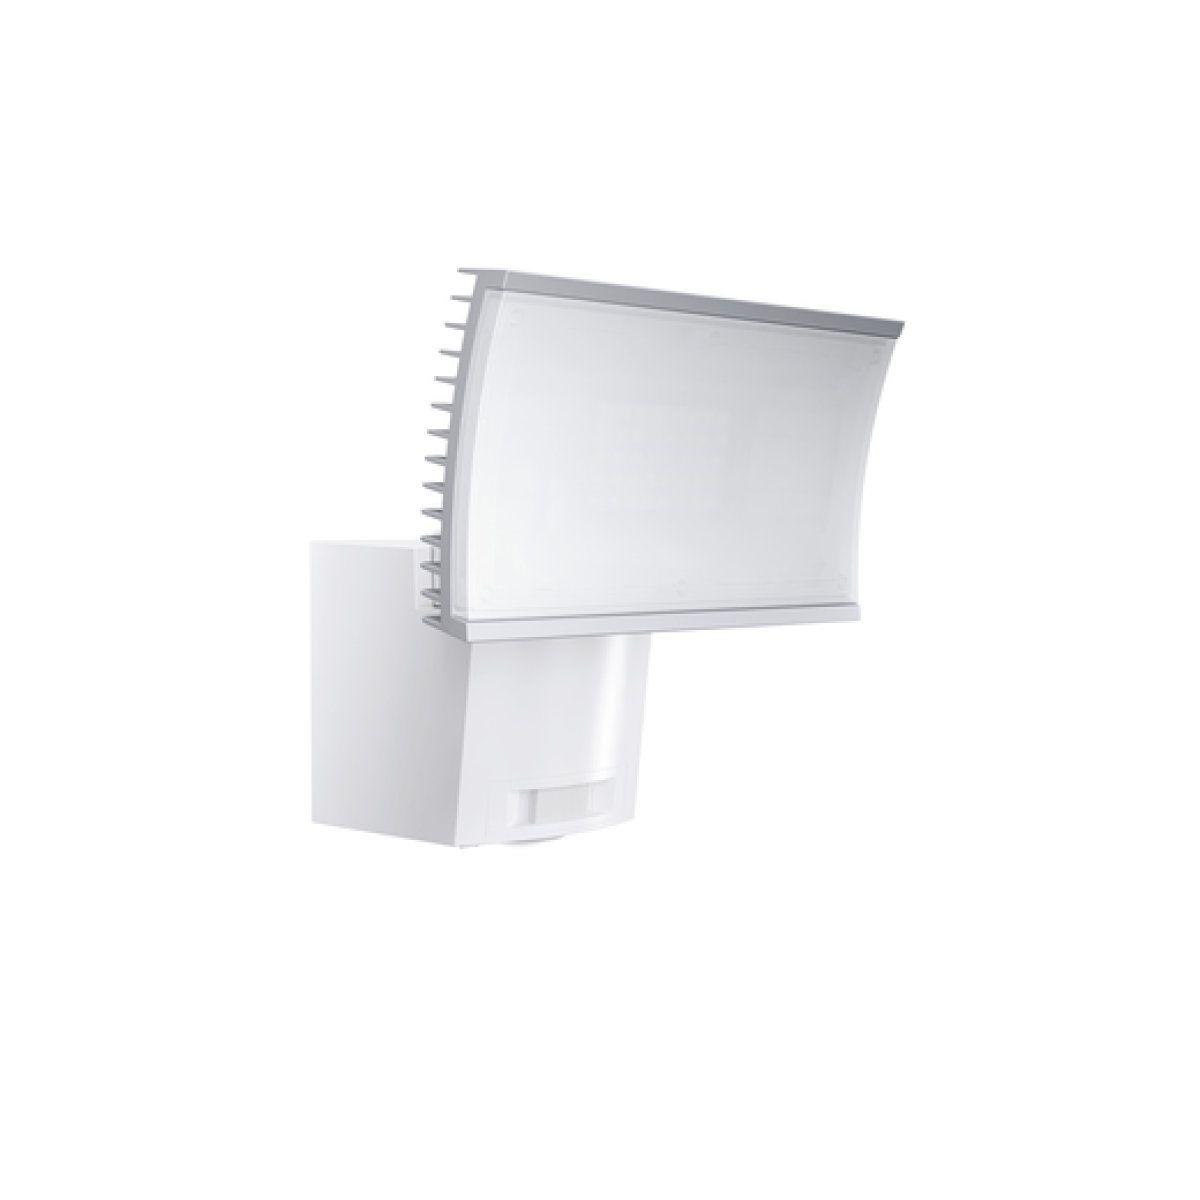 oprawa osram noxlite led floodlight 23w bia a 4052899917996. Black Bedroom Furniture Sets. Home Design Ideas